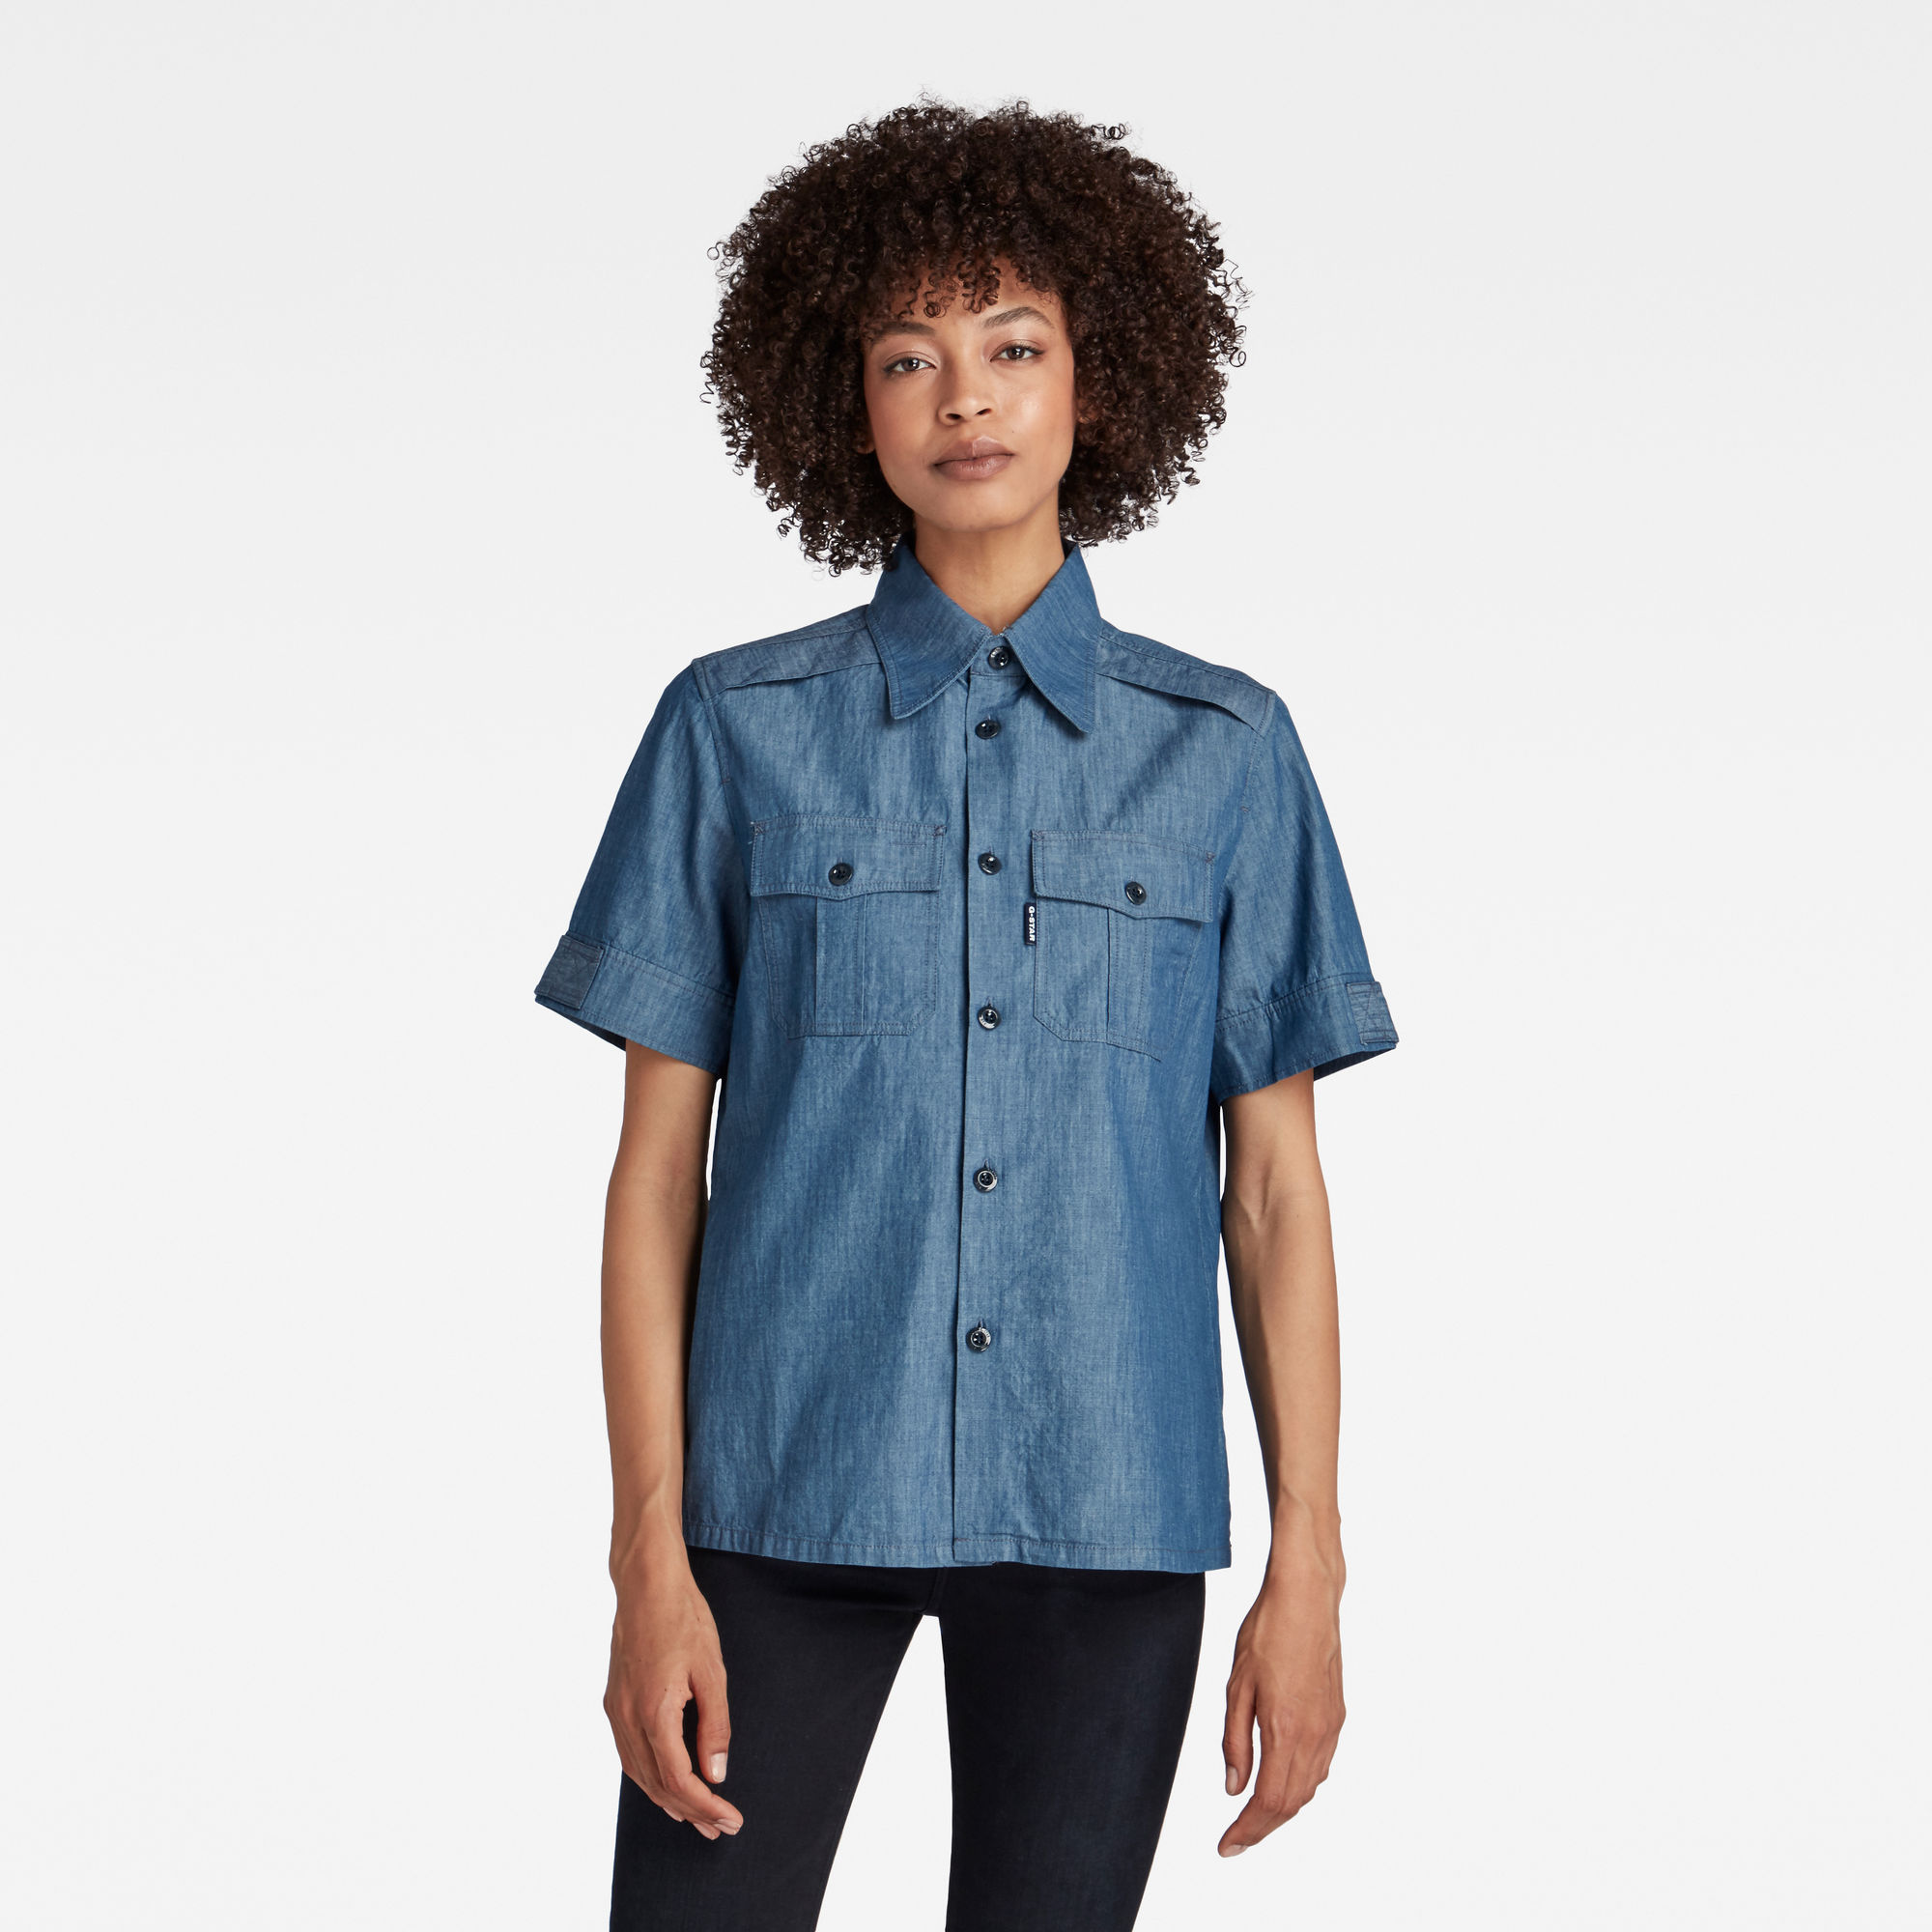 G-Star RAW Dames Officer Shirt Donkerblauw